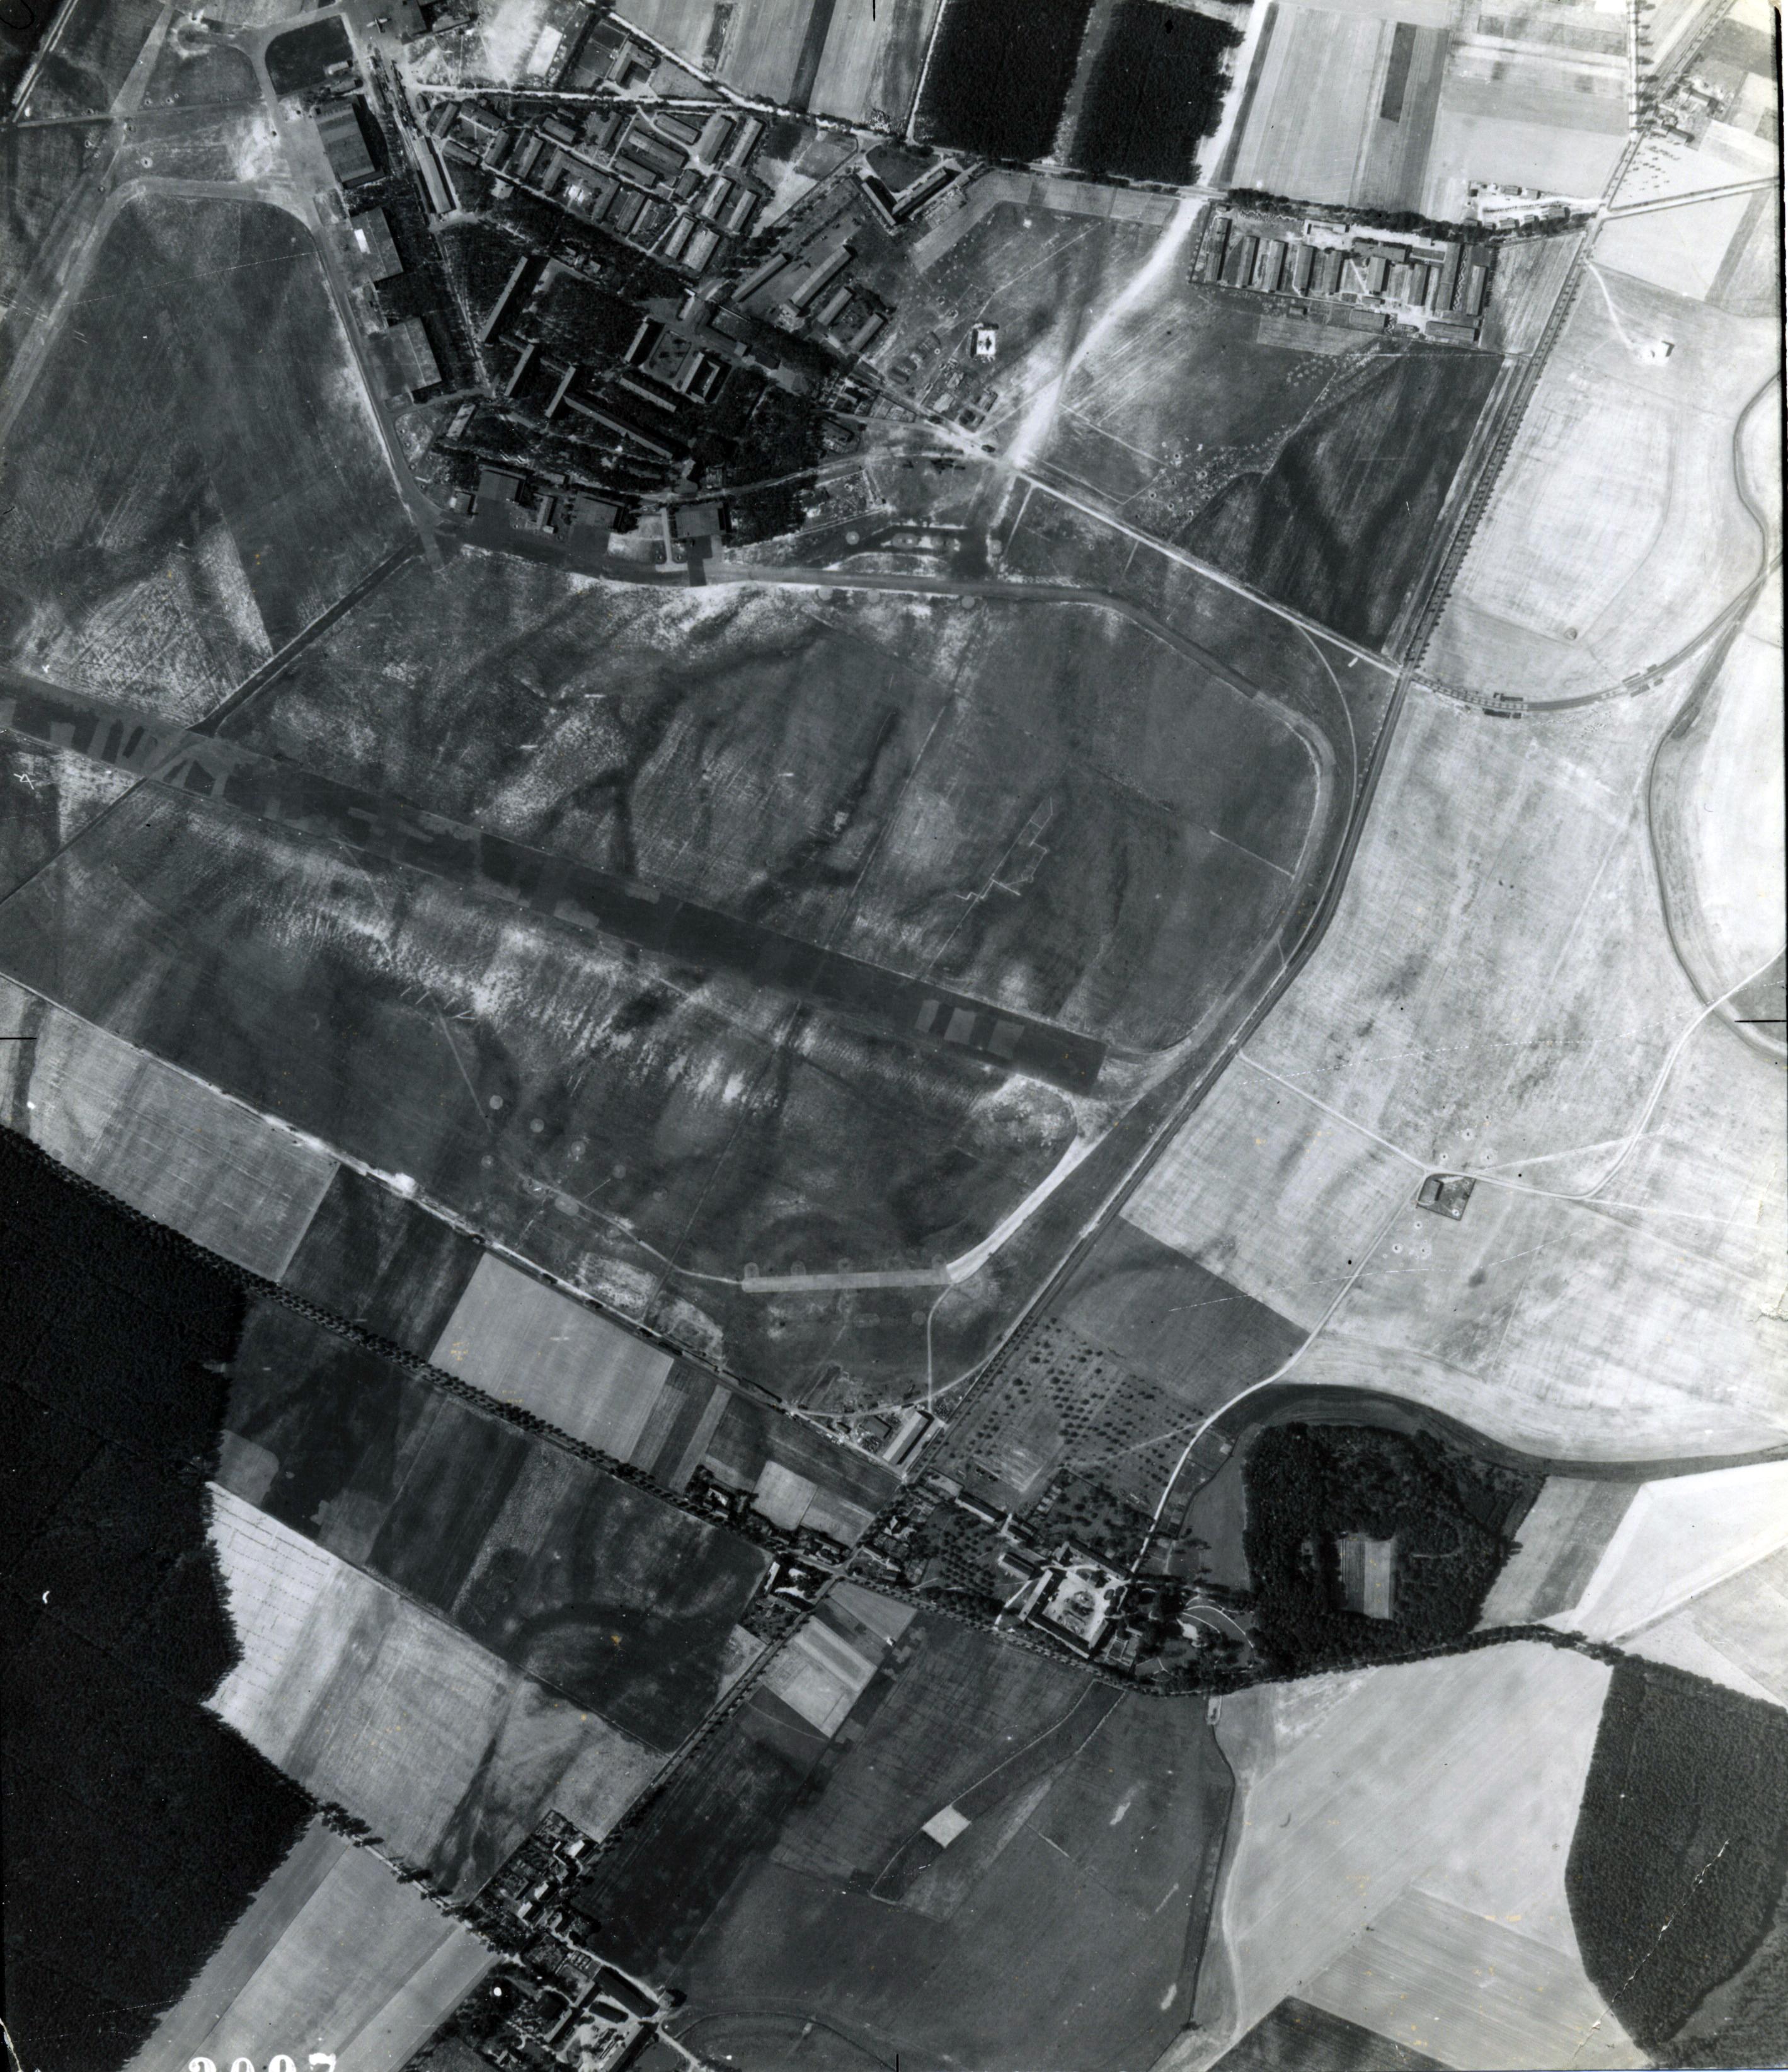 USAAAF 7PG22FS aerial recon photo to Alt Lonnewitz Luftwaffe Factory Airfield August 24 1944 01